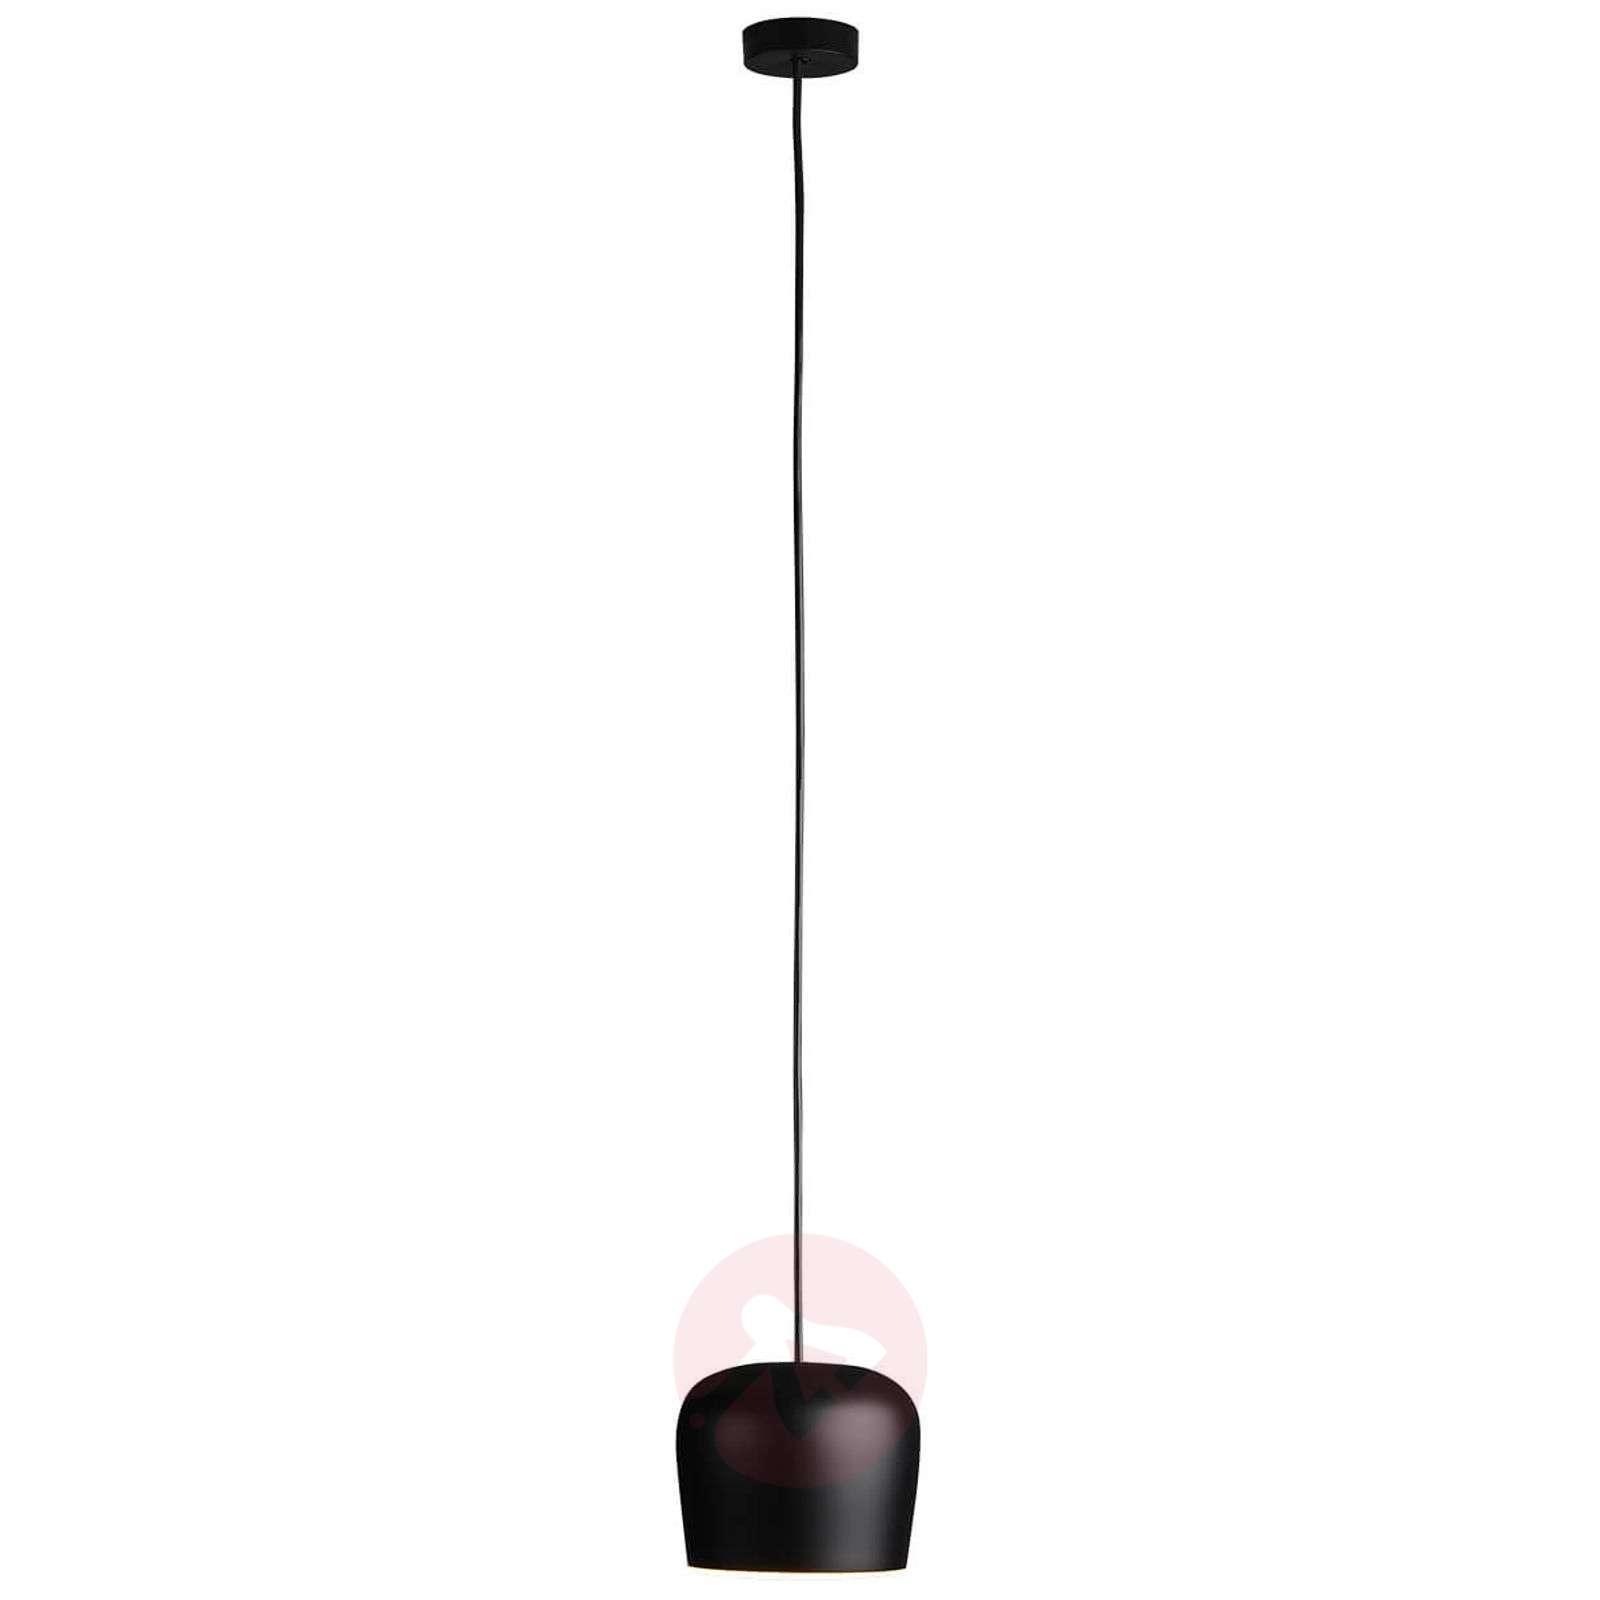 Aim Small Fix LED design-kattovalaisin, musta-3510323-01